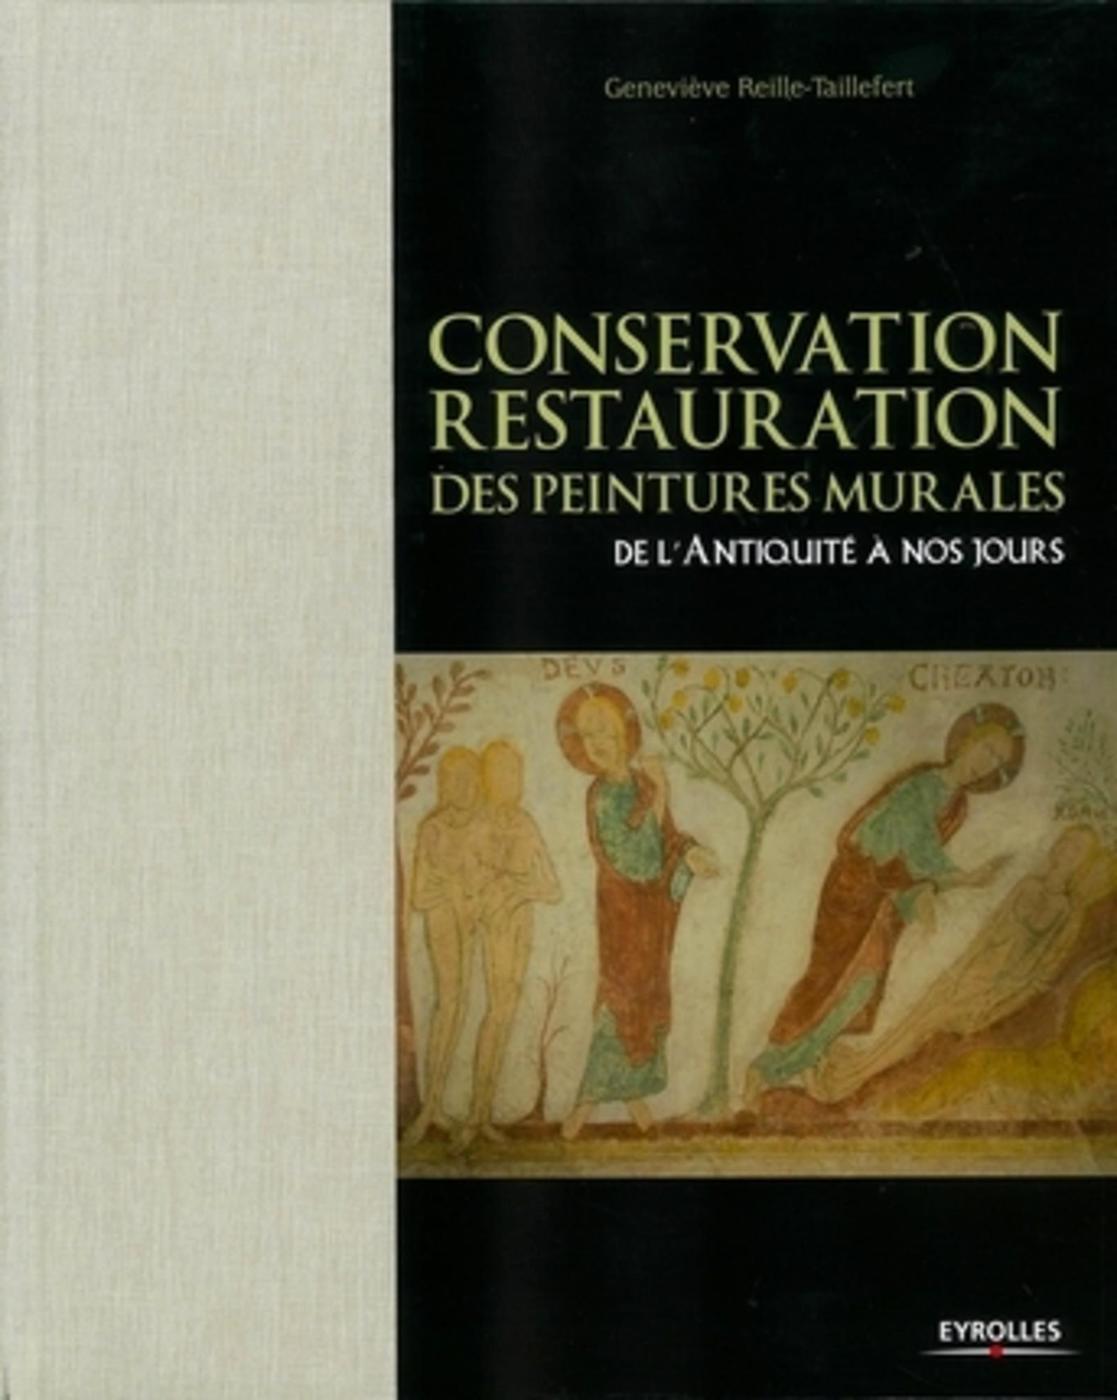 Conservation Restauration Des Peintures Murales Geneviève Librairie Eyrolles